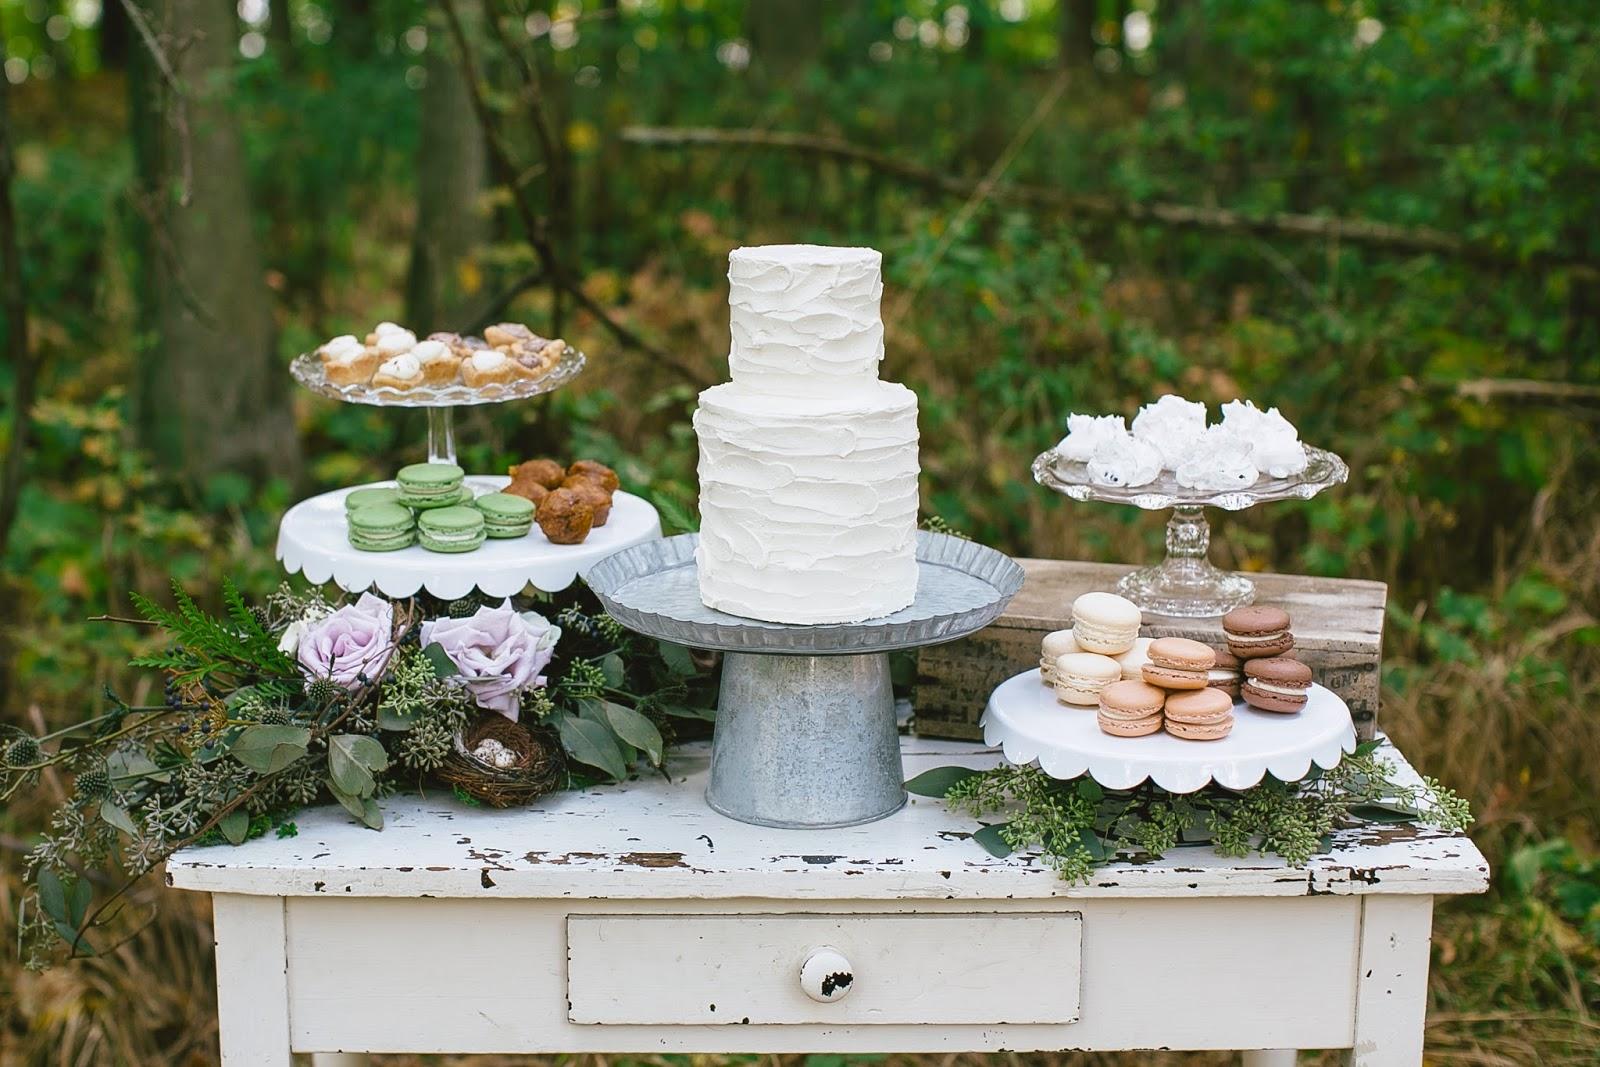 kj and co vintage rentals GTA oakville burlington niagara wedding planner ontario